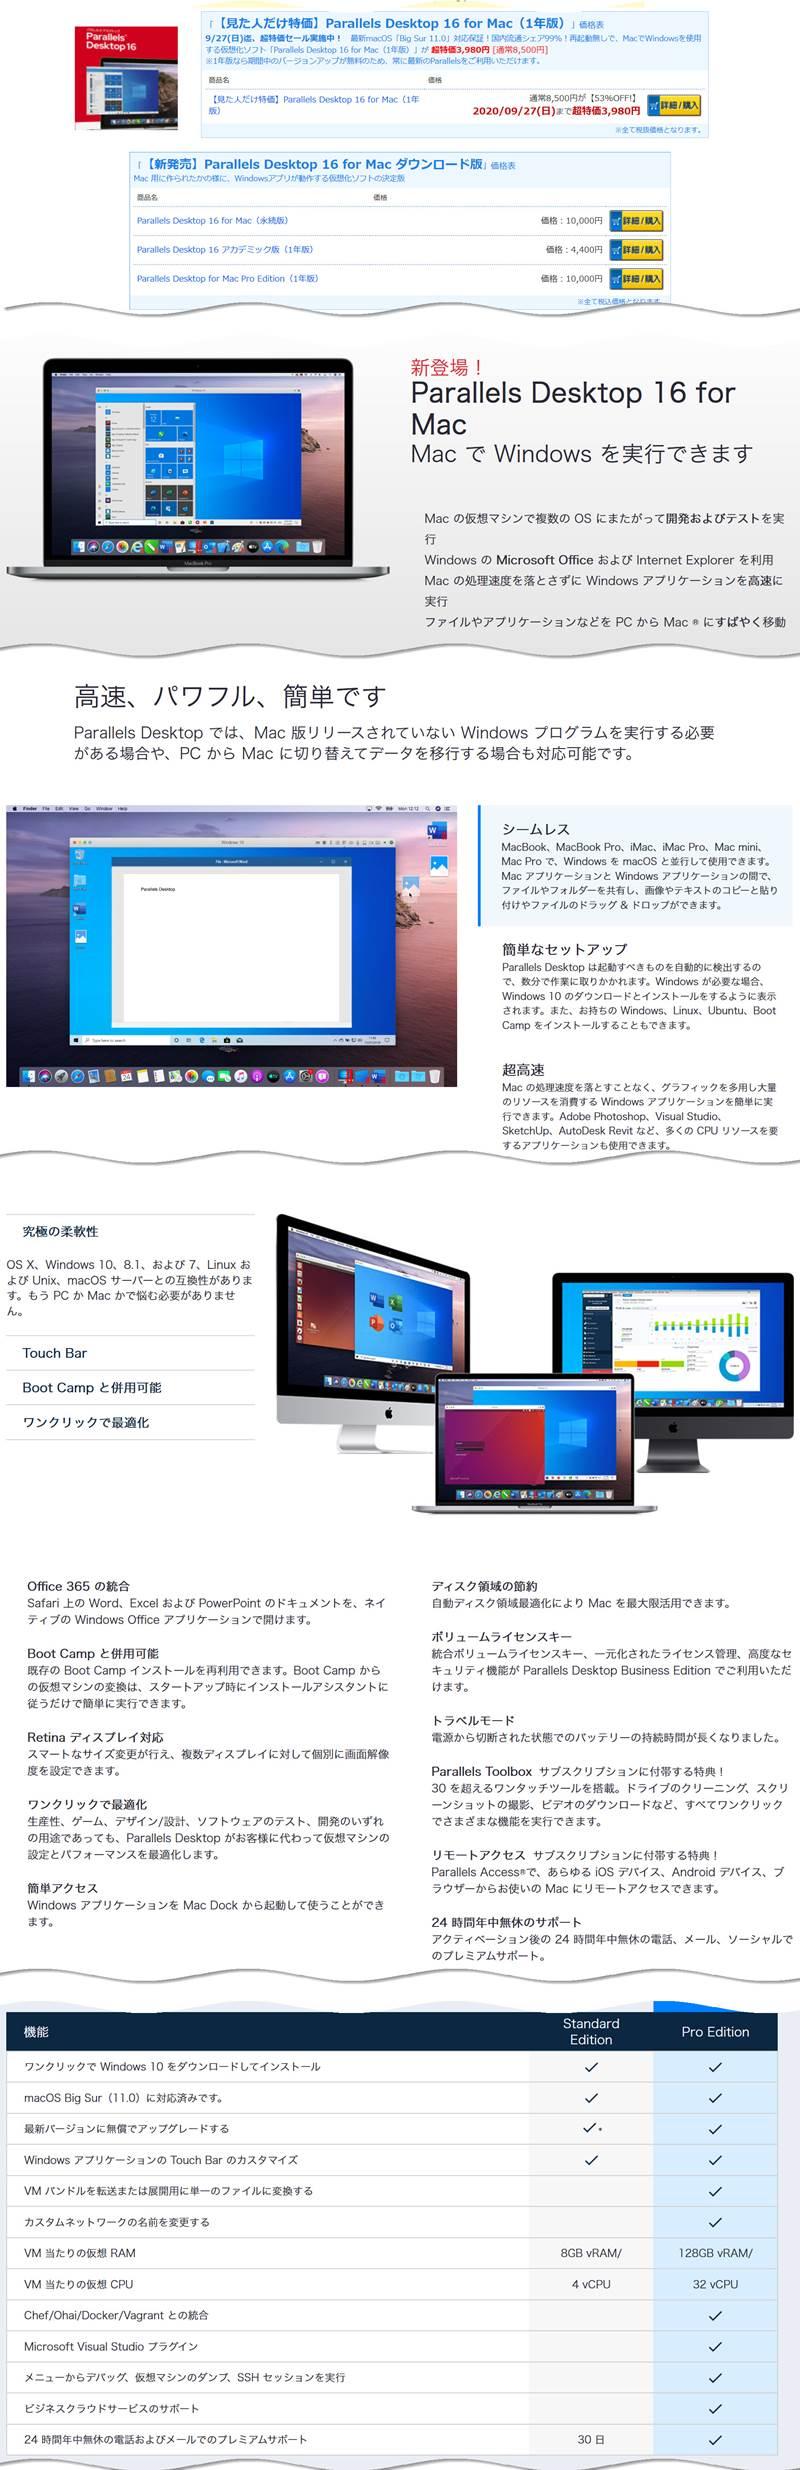 Parallels Desktop 16(1年版)が3,980円!